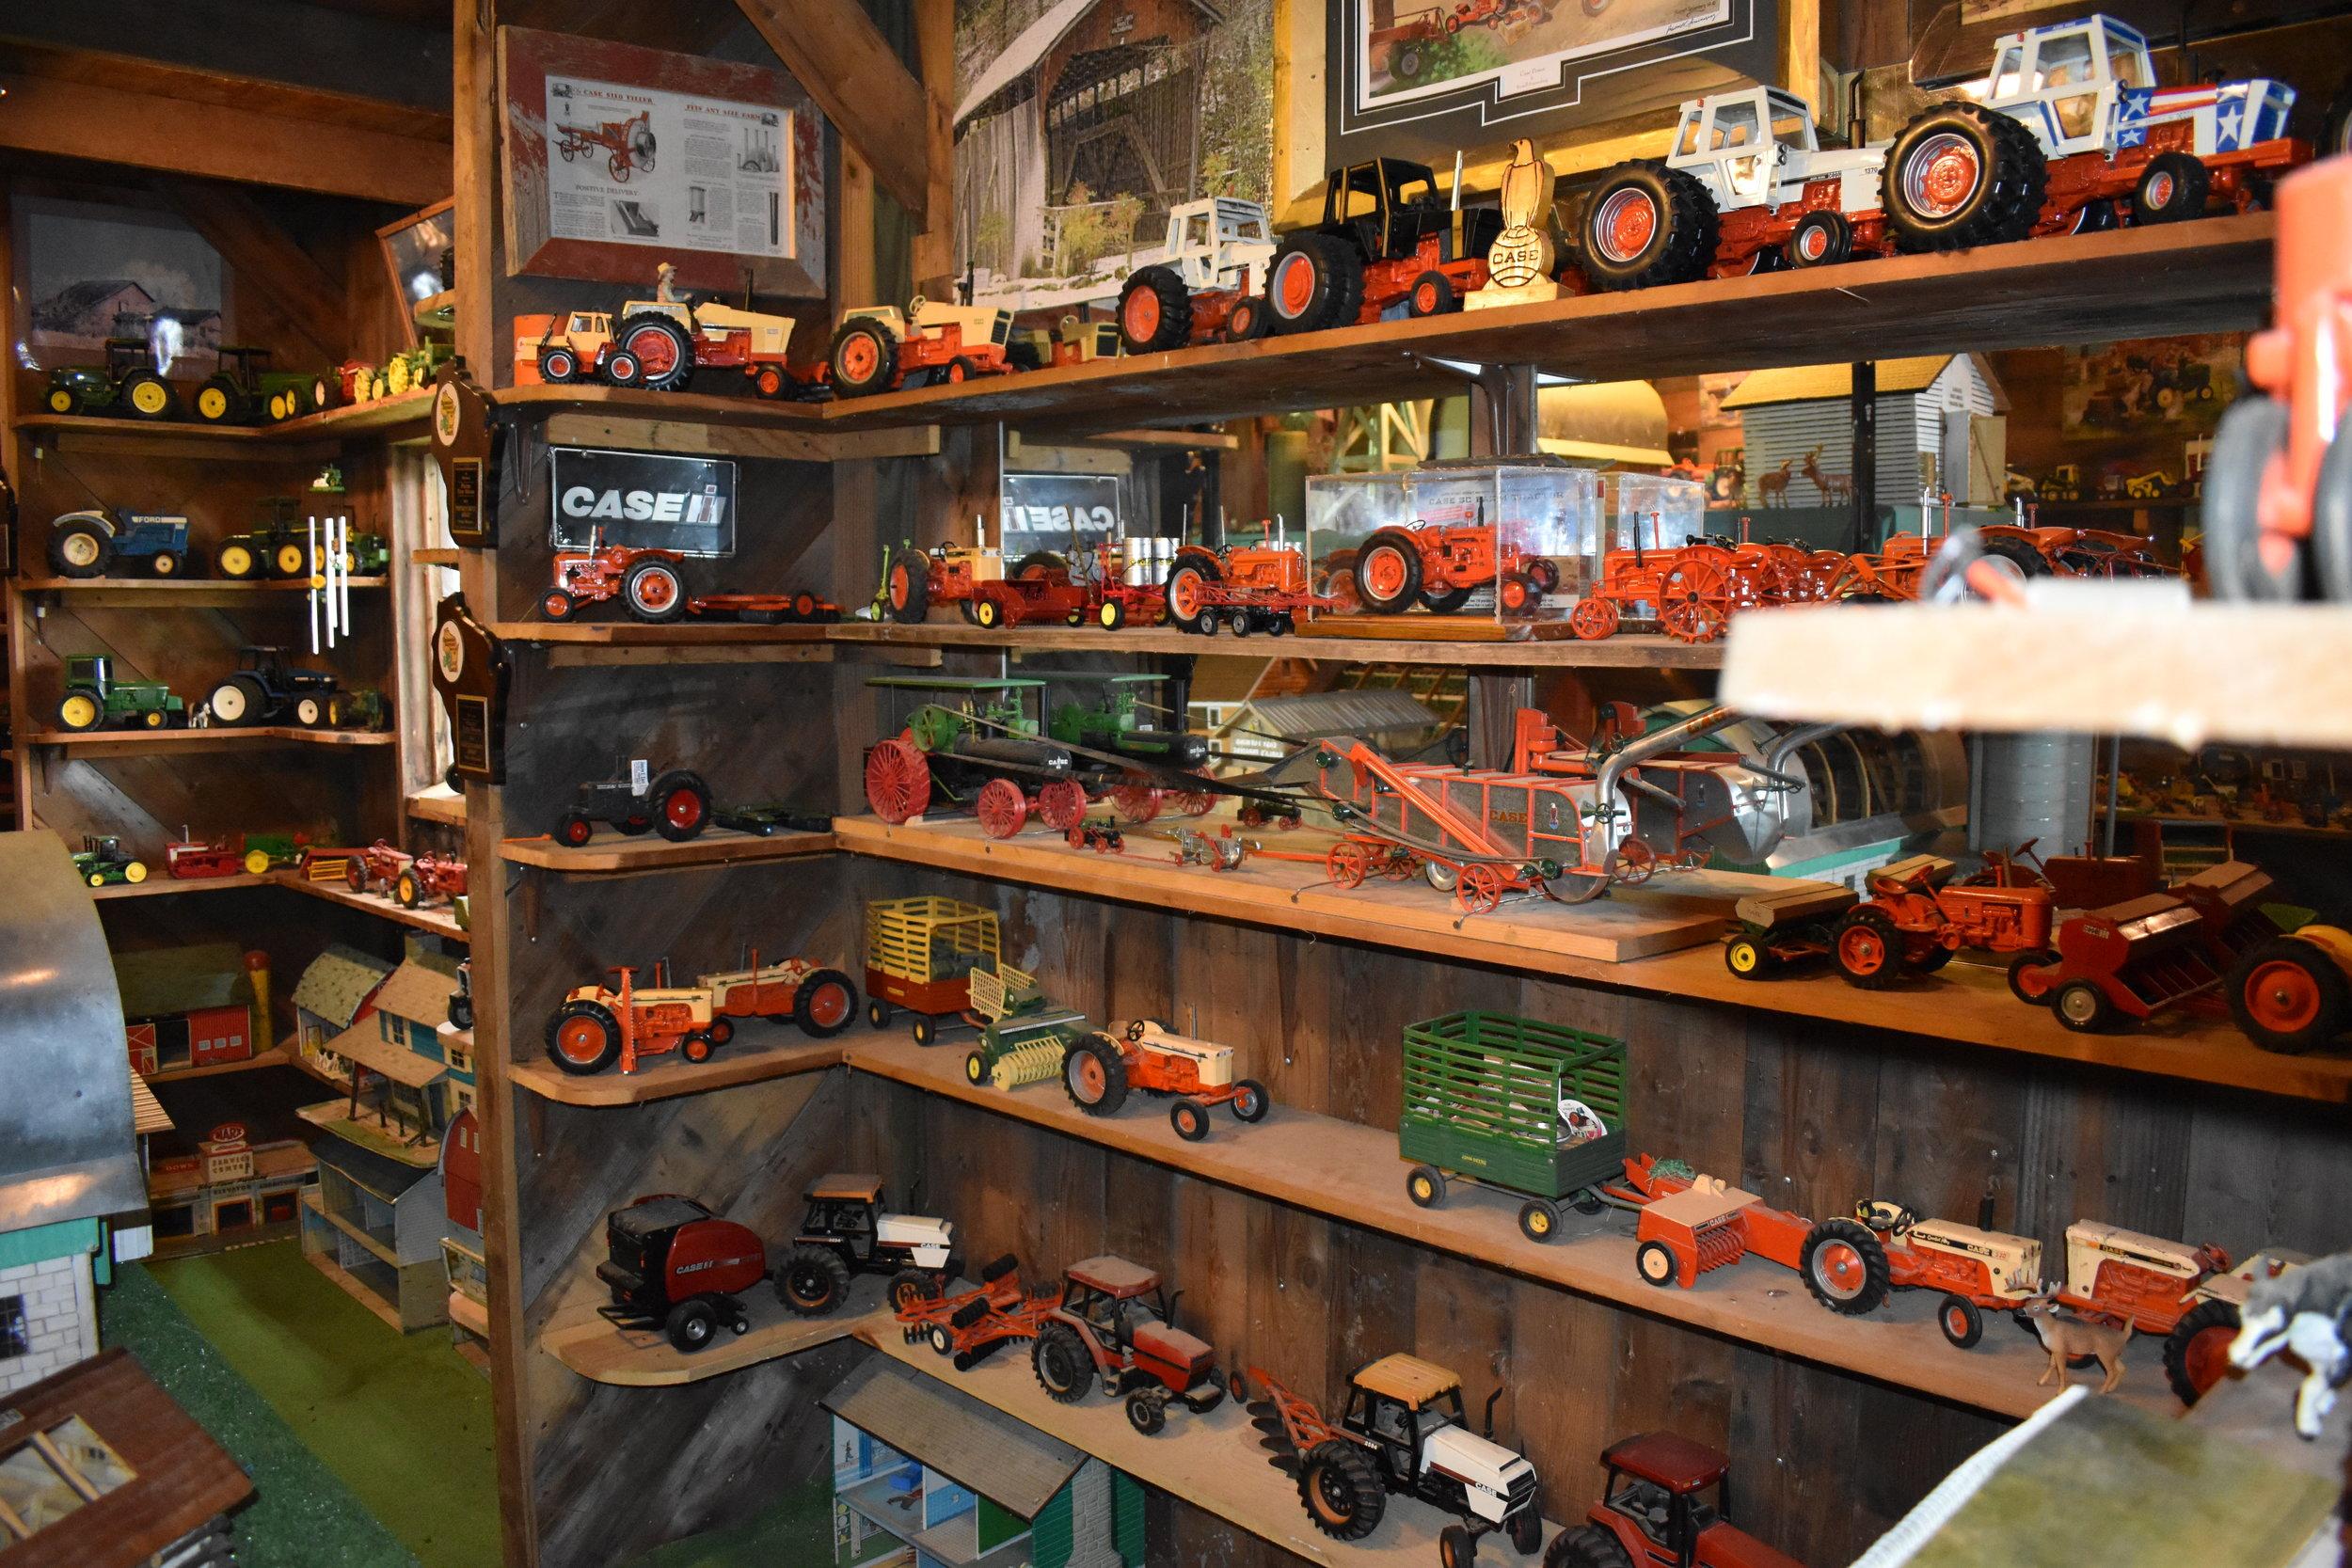 Admundson's favorite collection of Case tractors